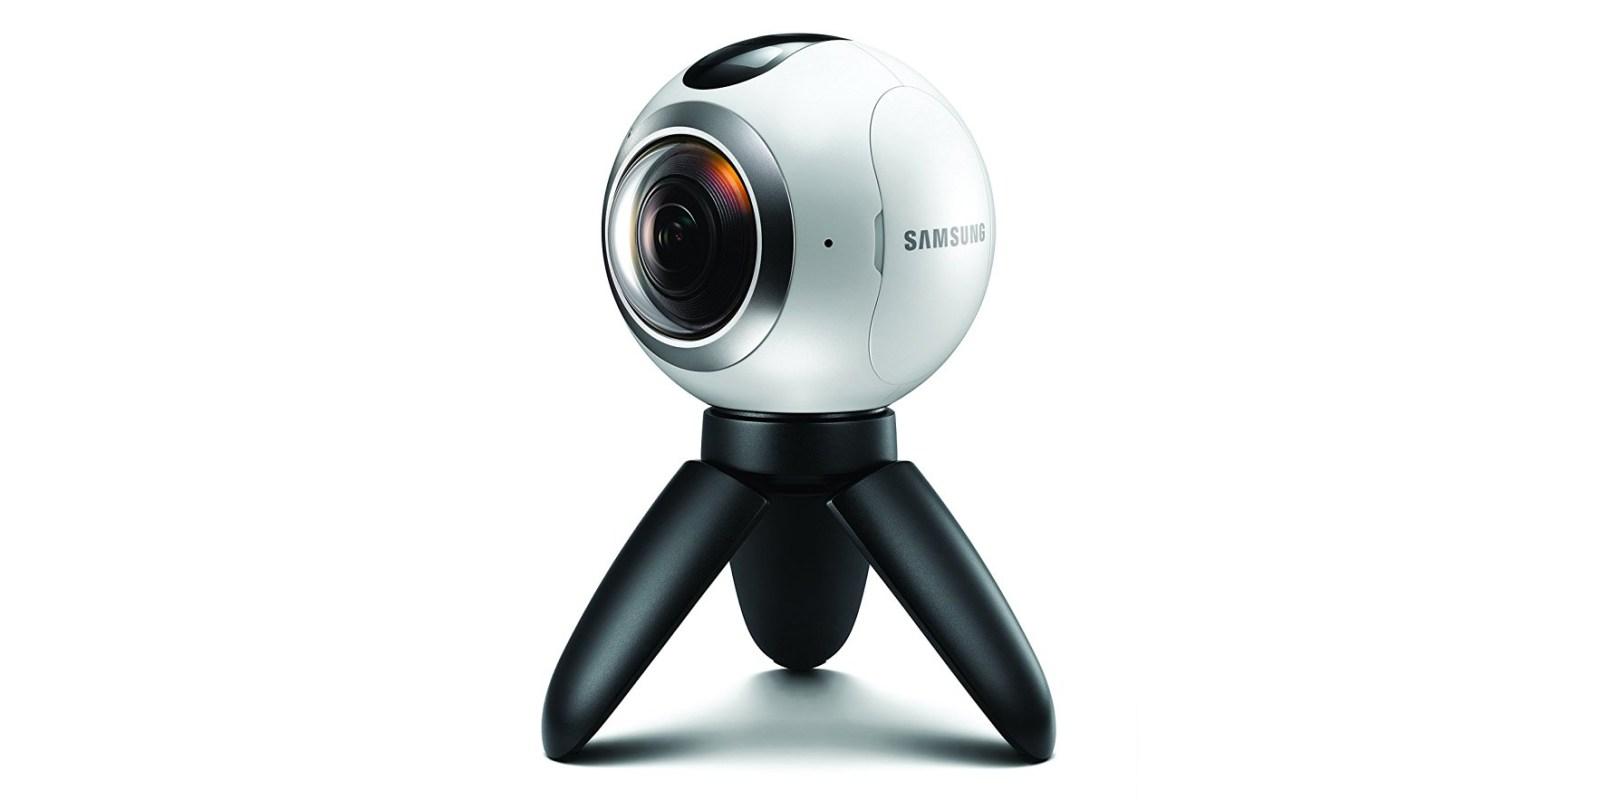 Samsung Gear 360 VR Camera for $110 shipped (Reg. $160)